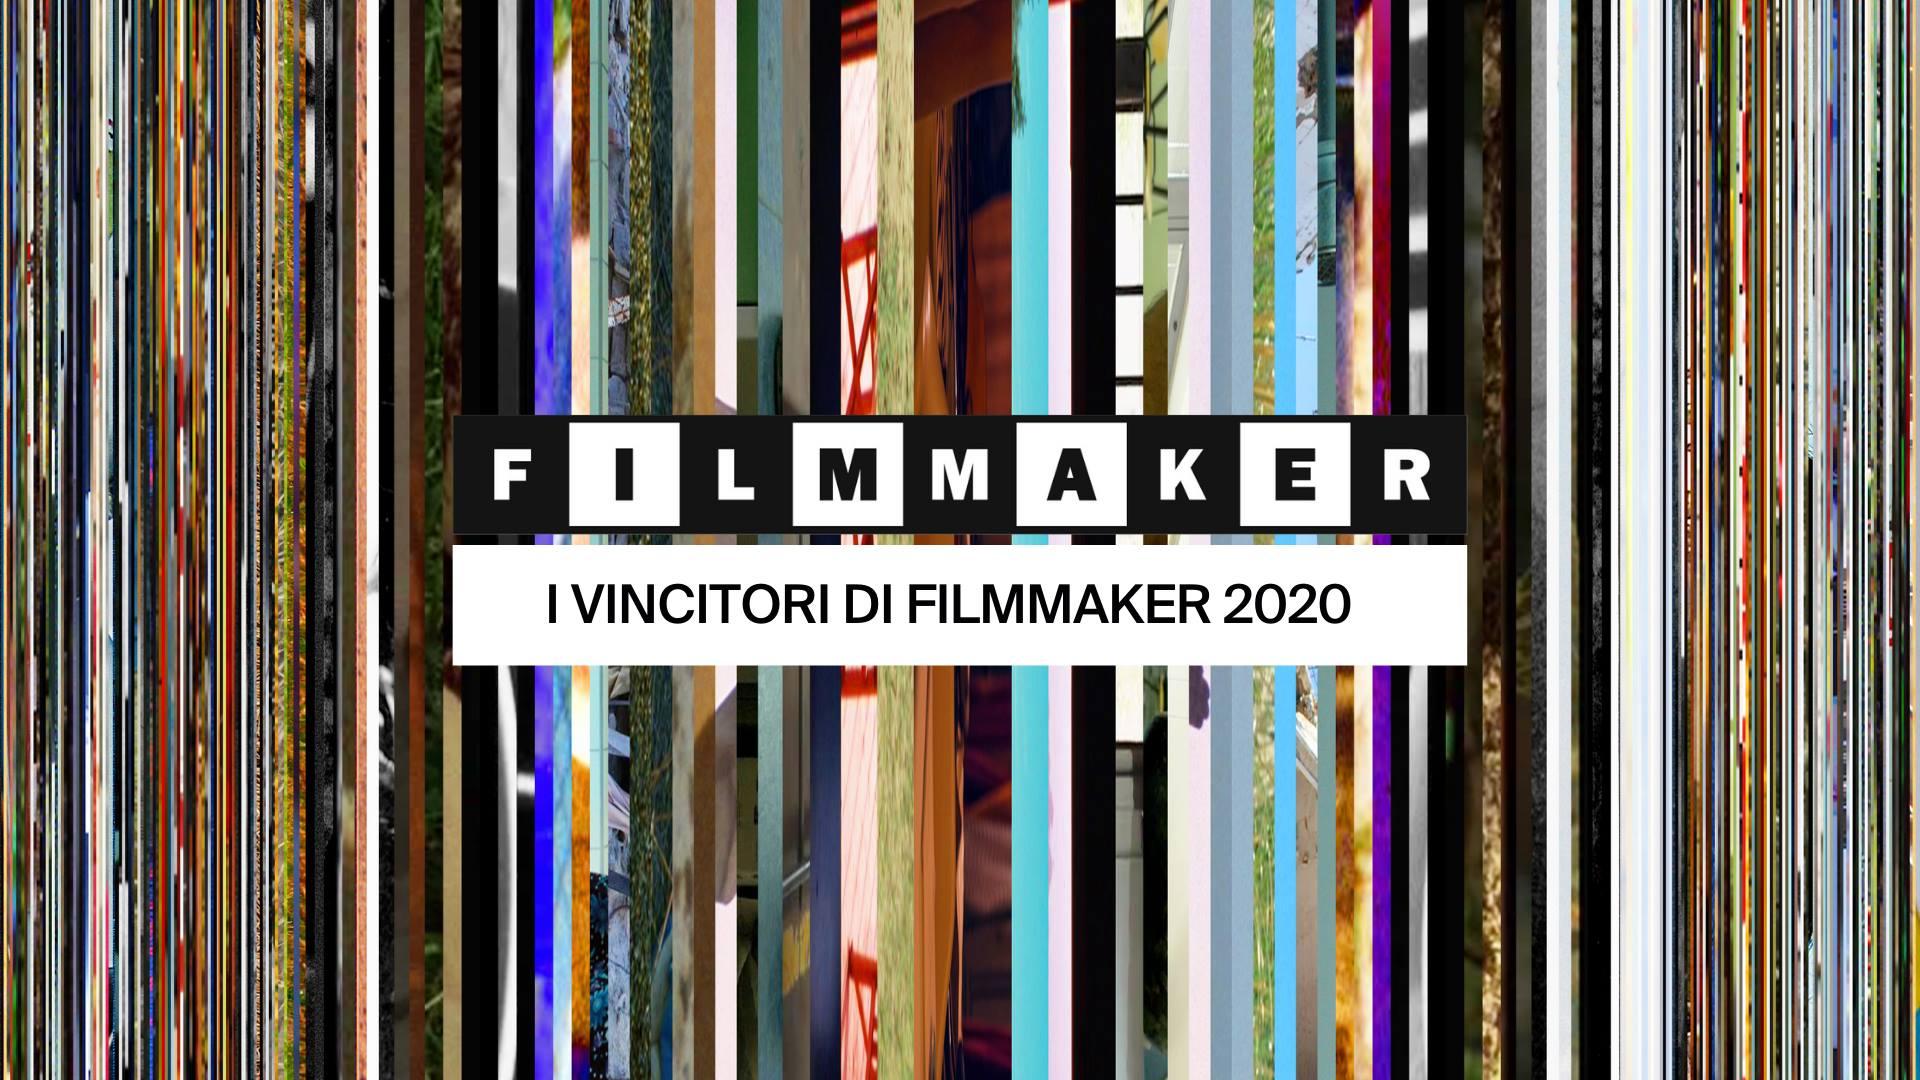 filmmaker 2020